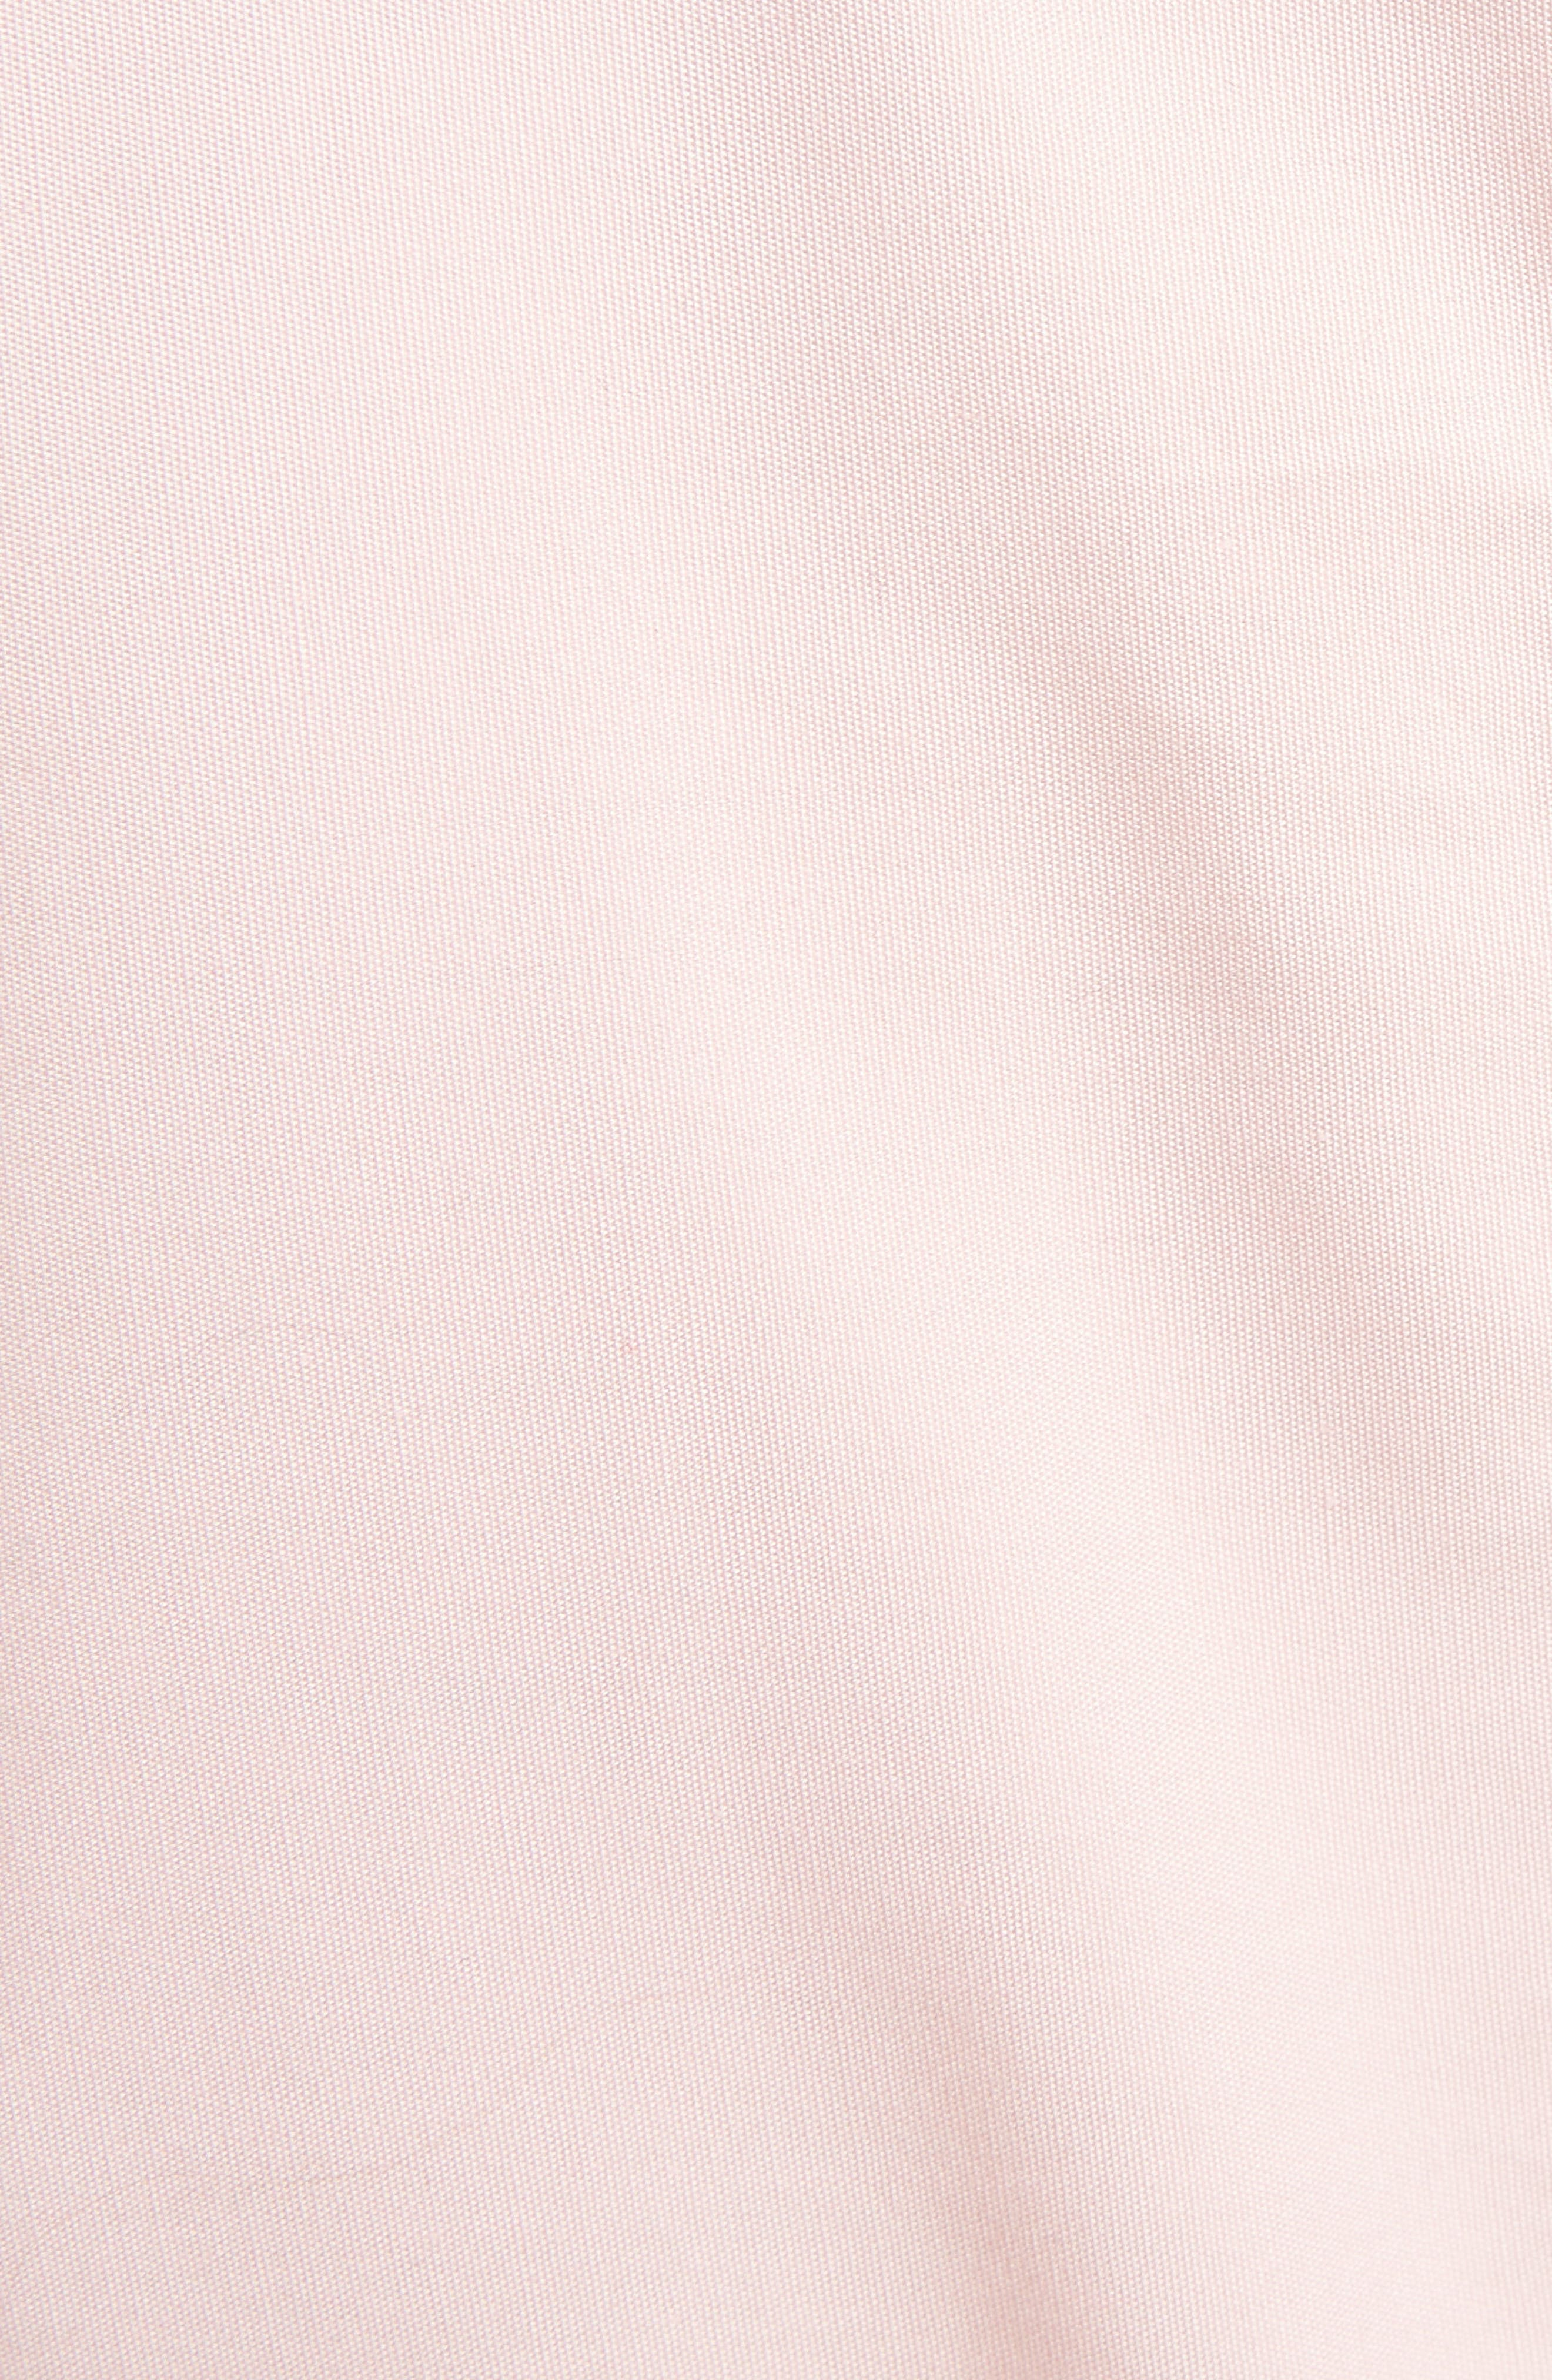 Asymmetrical Ruched Cotton Blouse,                             Alternate thumbnail 5, color,                             650